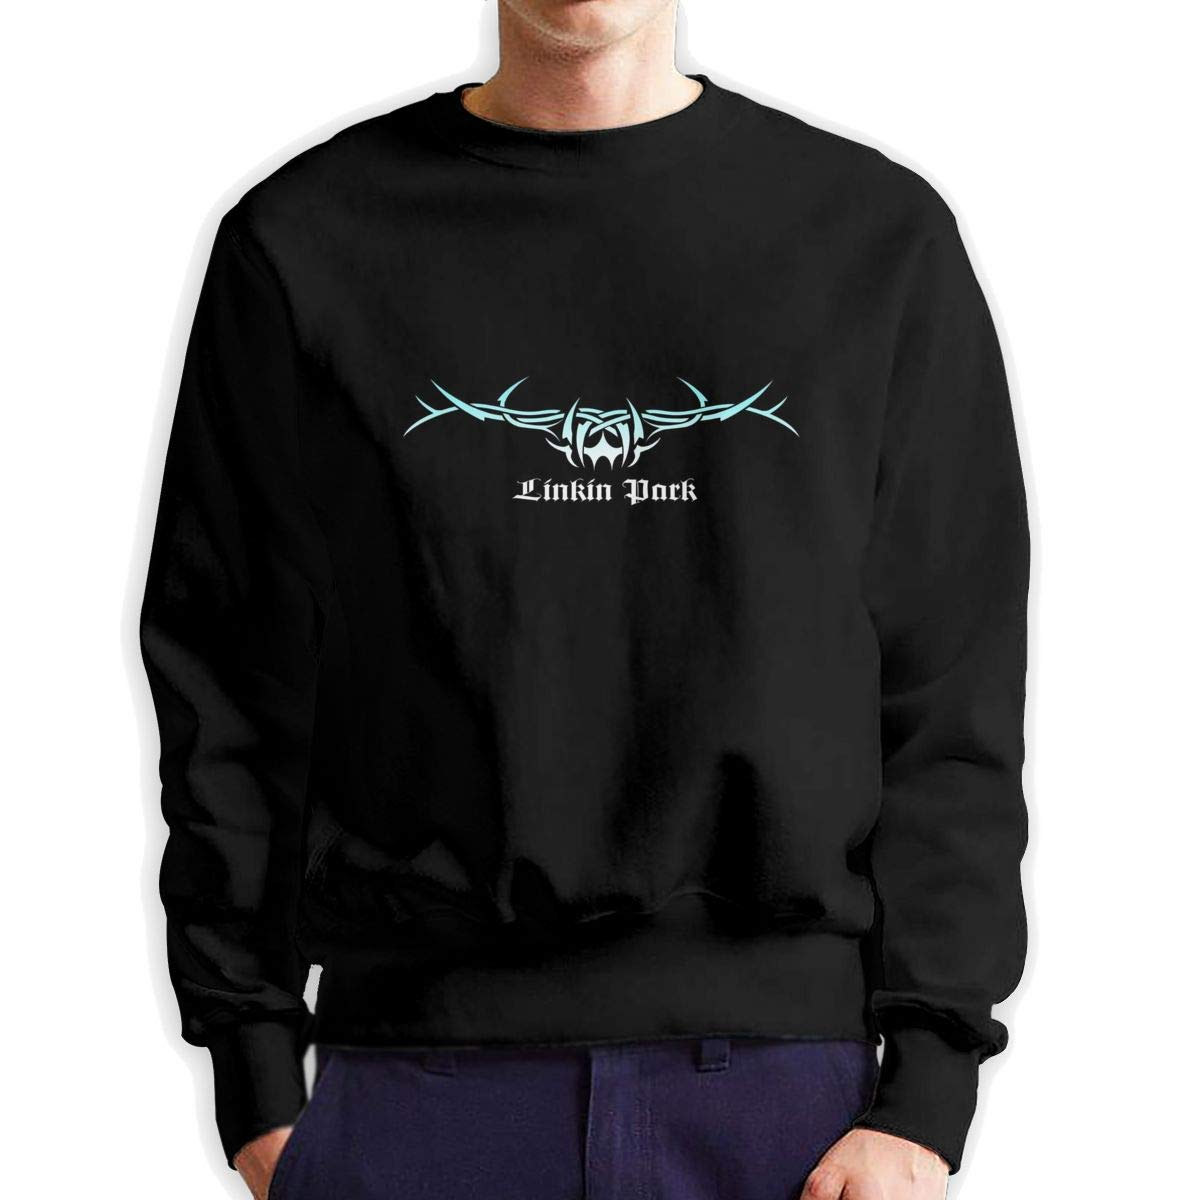 Lin-kin Rock Park Men's Sweater Shirt Pullover Long Sleeve for Boy Men Unique Cozy Crew Neck 3D Printed Hoodies Tops Black